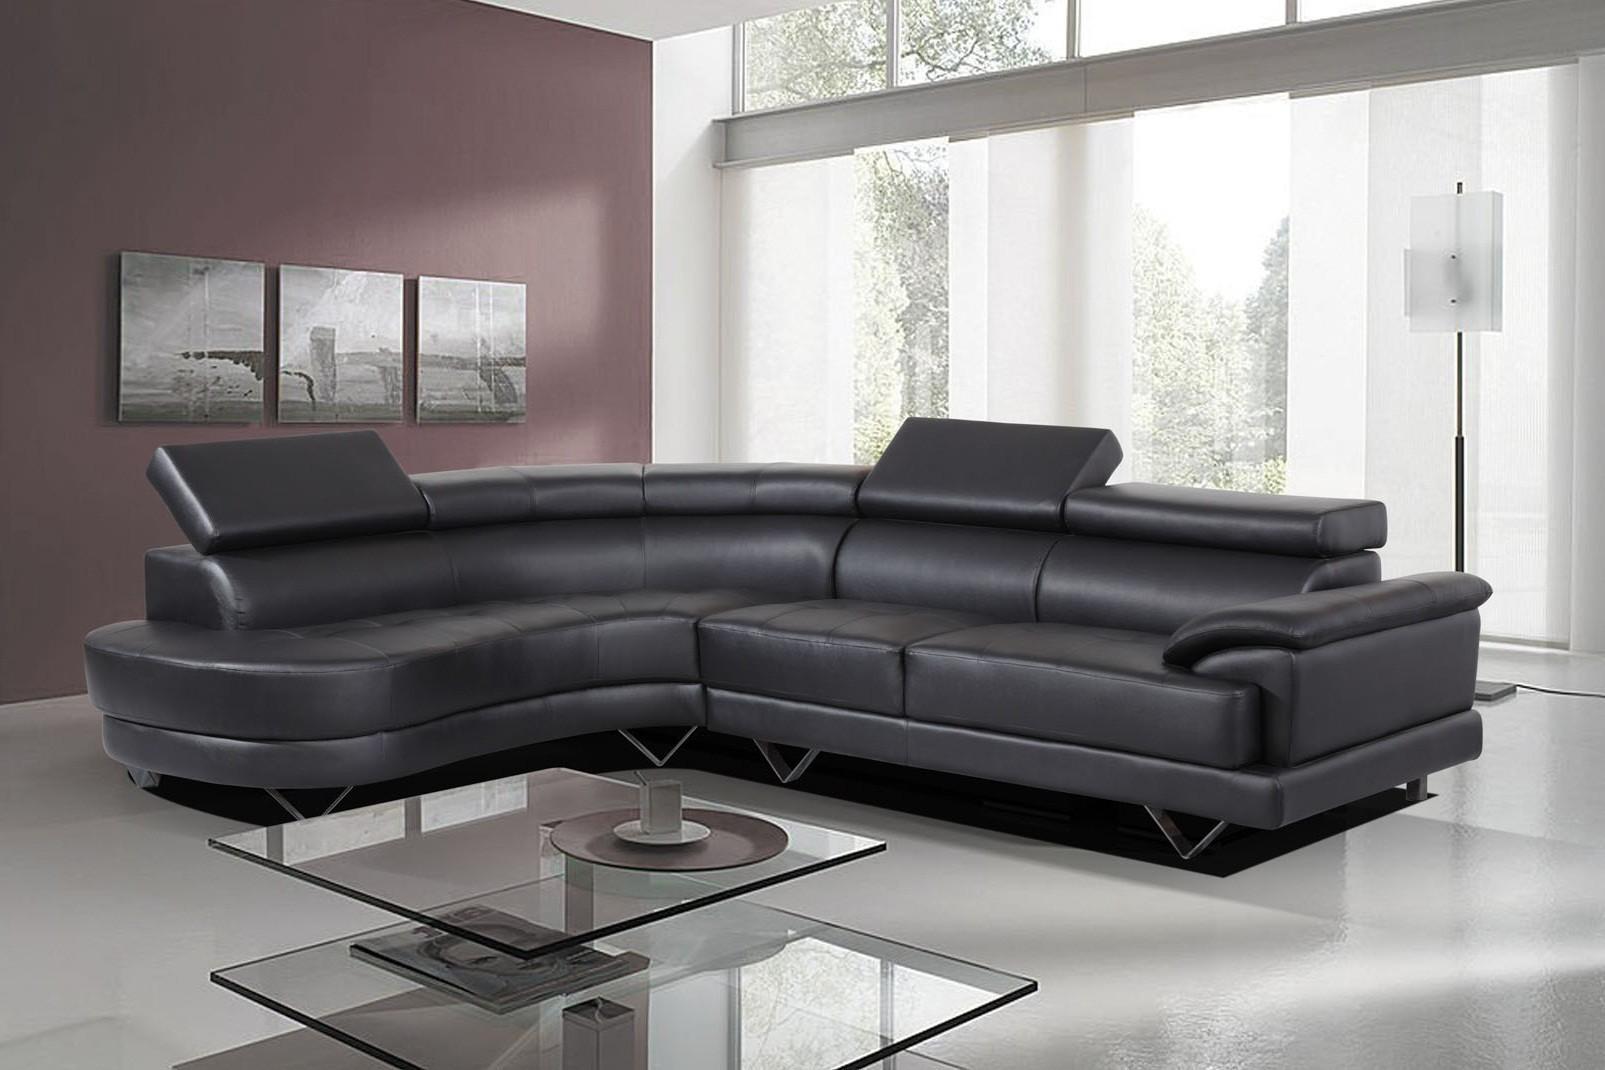 Leather Sofa At Isofas | Latest Designer Leather Sofas Throughout Corner Sofa Leather (Image 12 of 20)